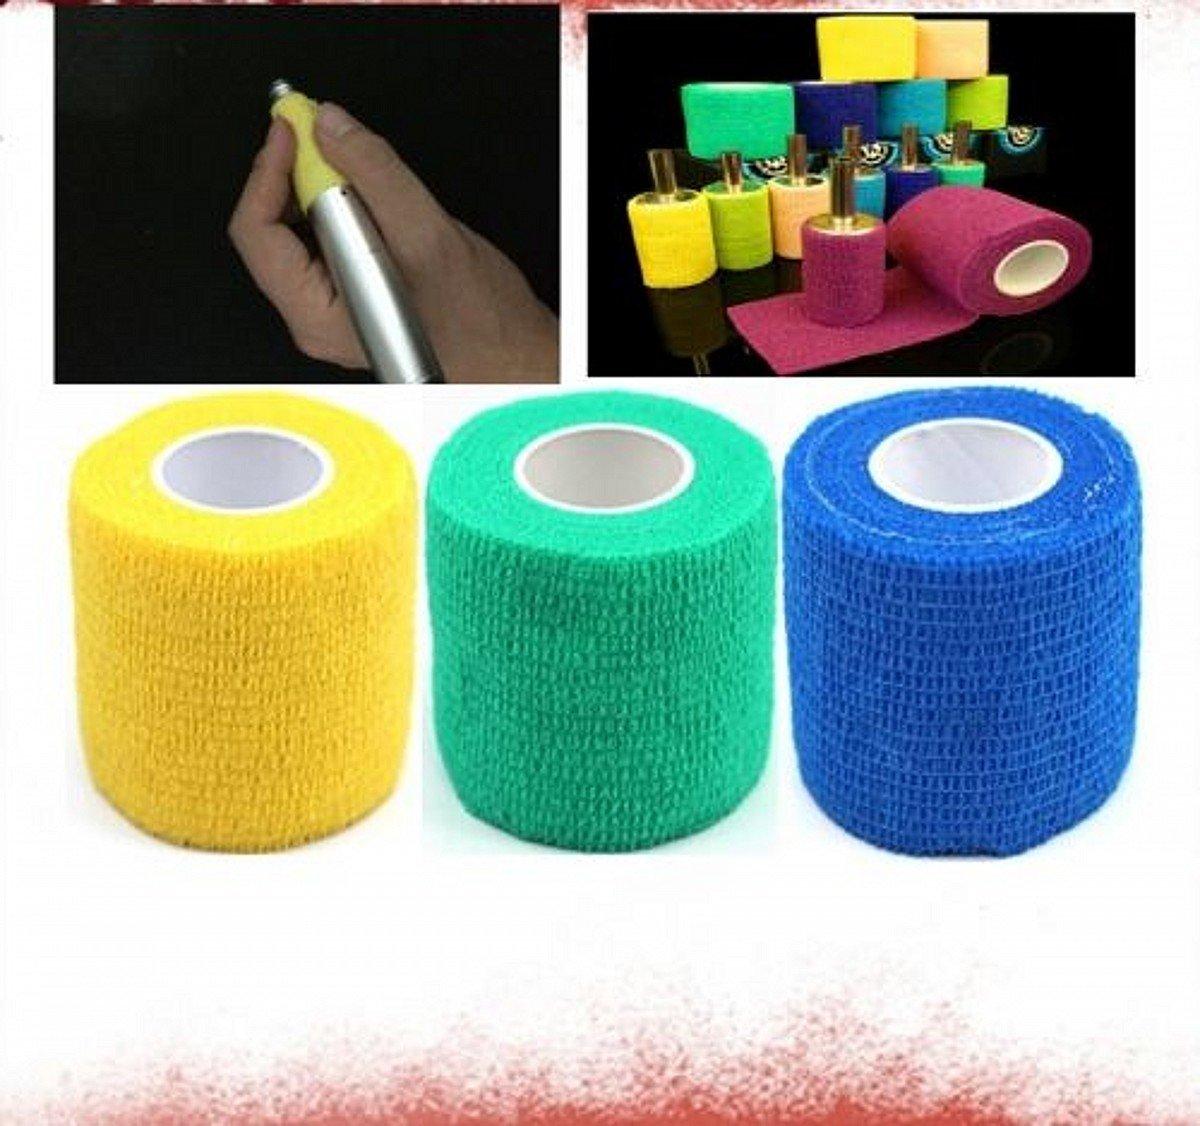 WellieSTR 3pc Medical gauze bandage permanent makeup pen stainless tattoo machine grip kit (random color) Ltd